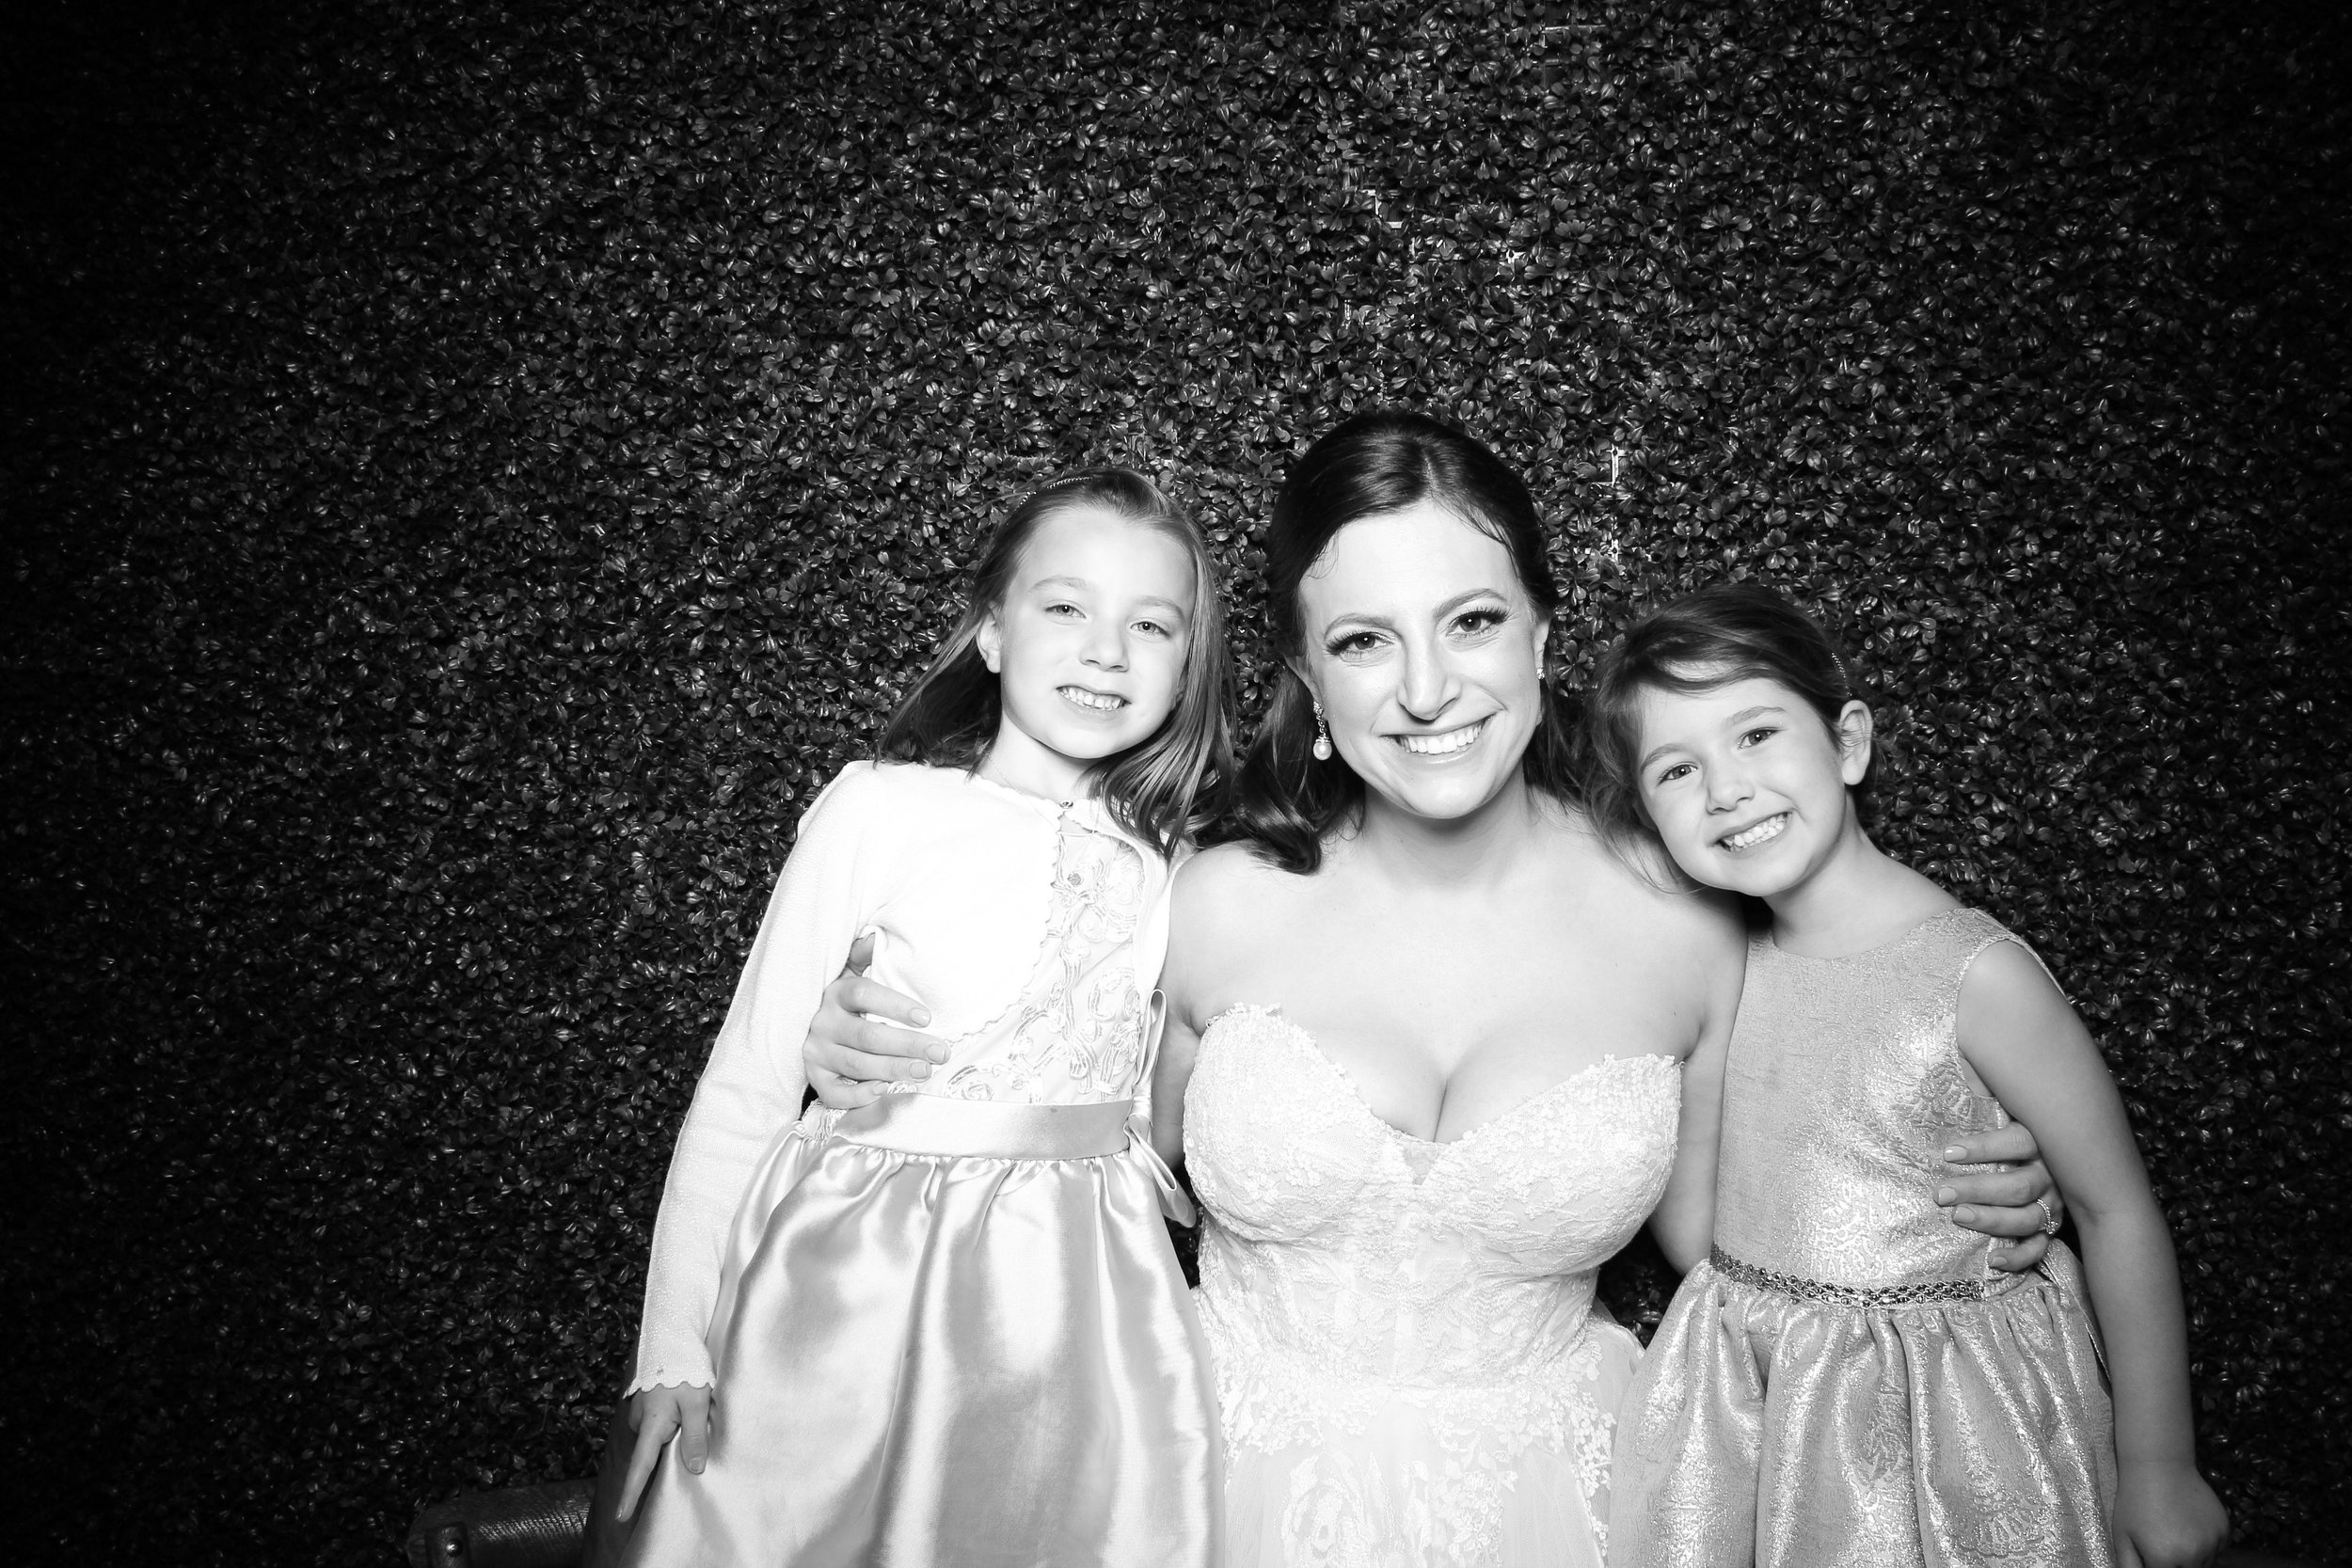 Ivy_Room_Chicago_Wedding_Reception_Photo_Booth_Rental__18.jpg